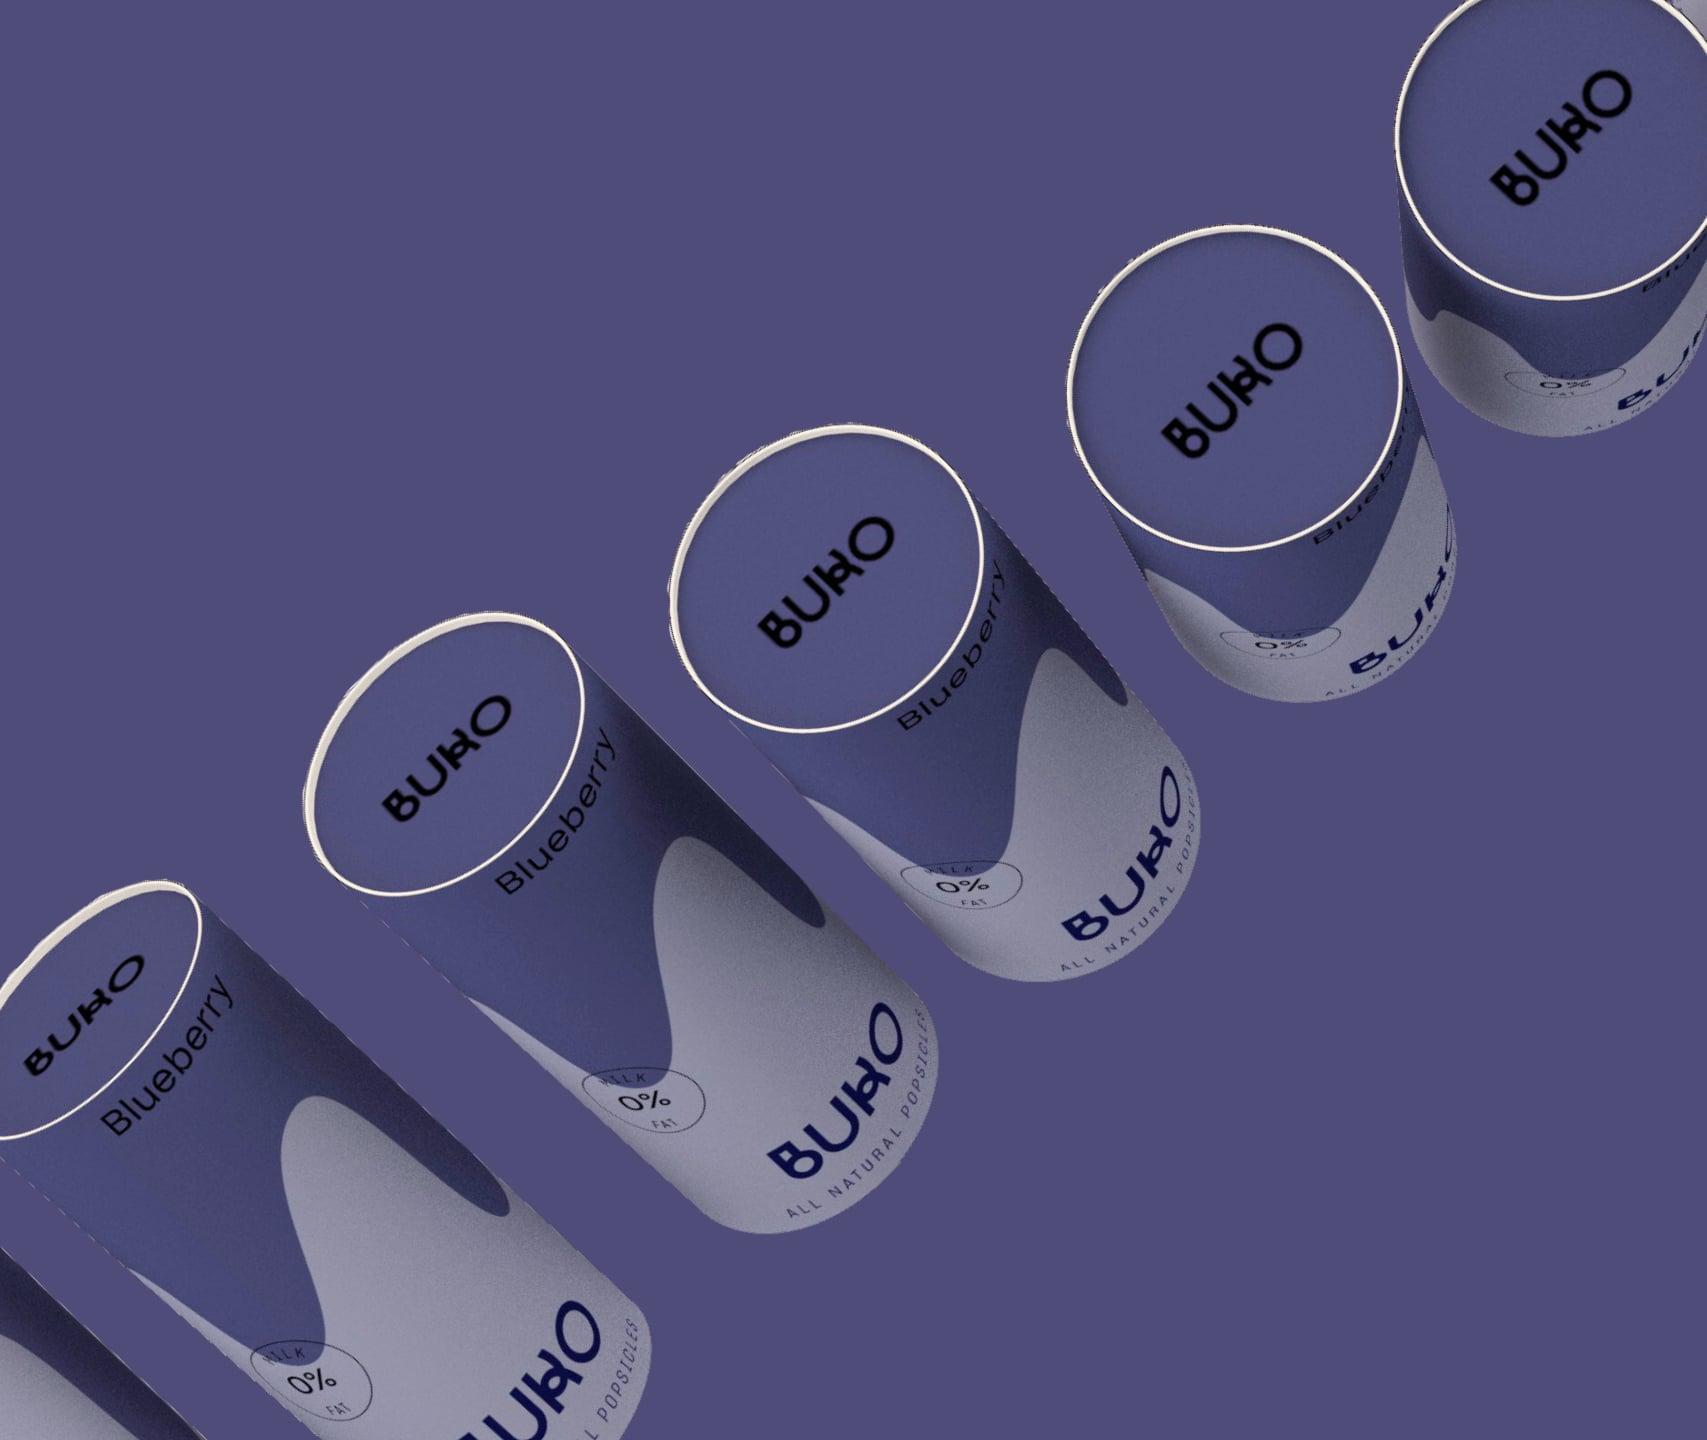 mantik-digital-creative-agency-branding-popsicle-icecream-packaging-experience-web-design-development25-min